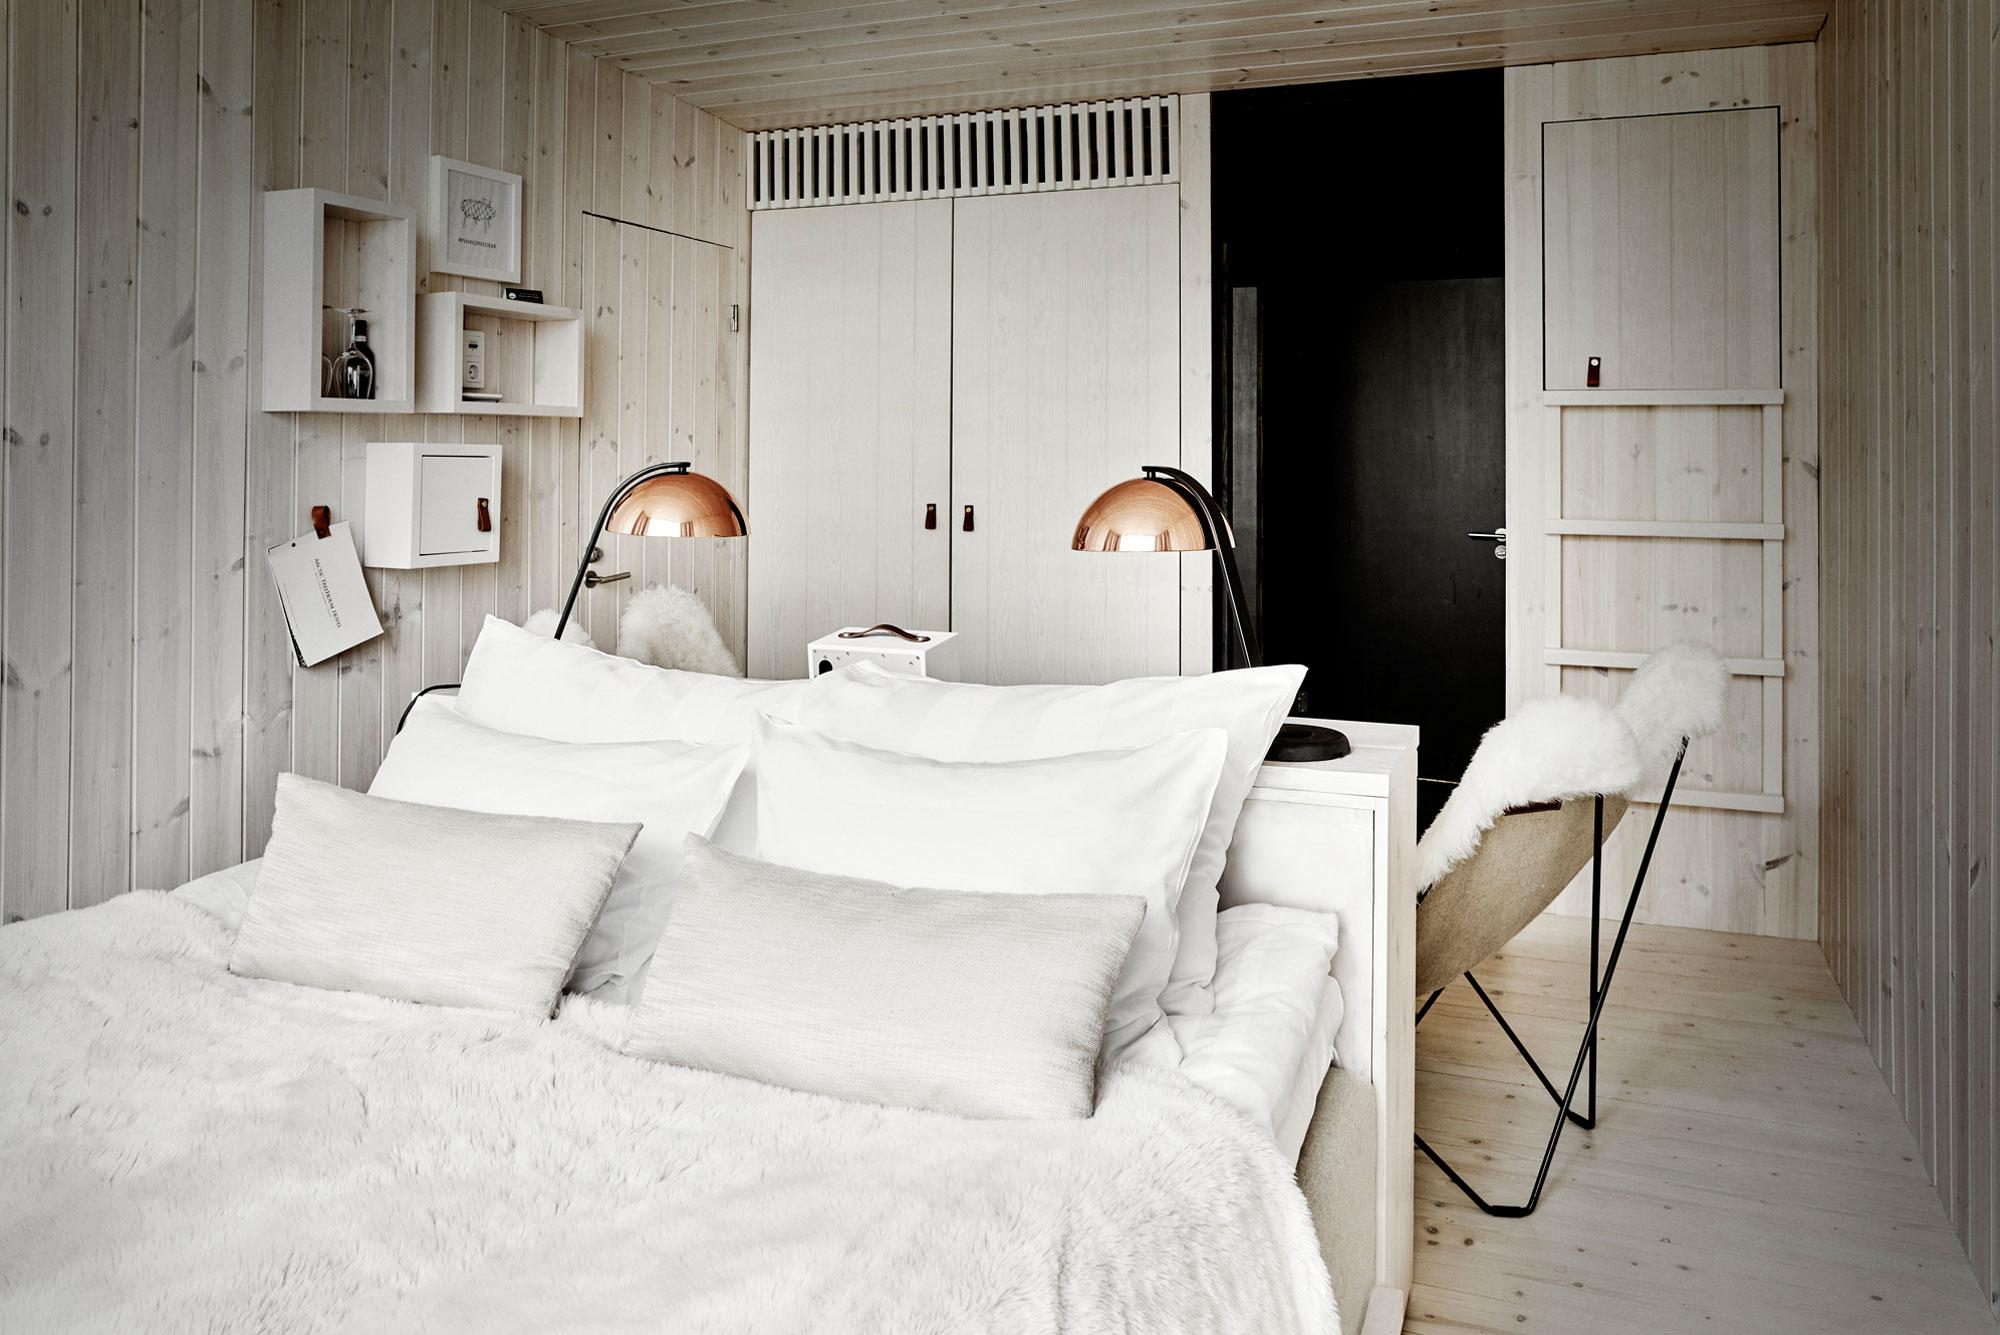 Arctic TreeHouse Hotel Accommodation